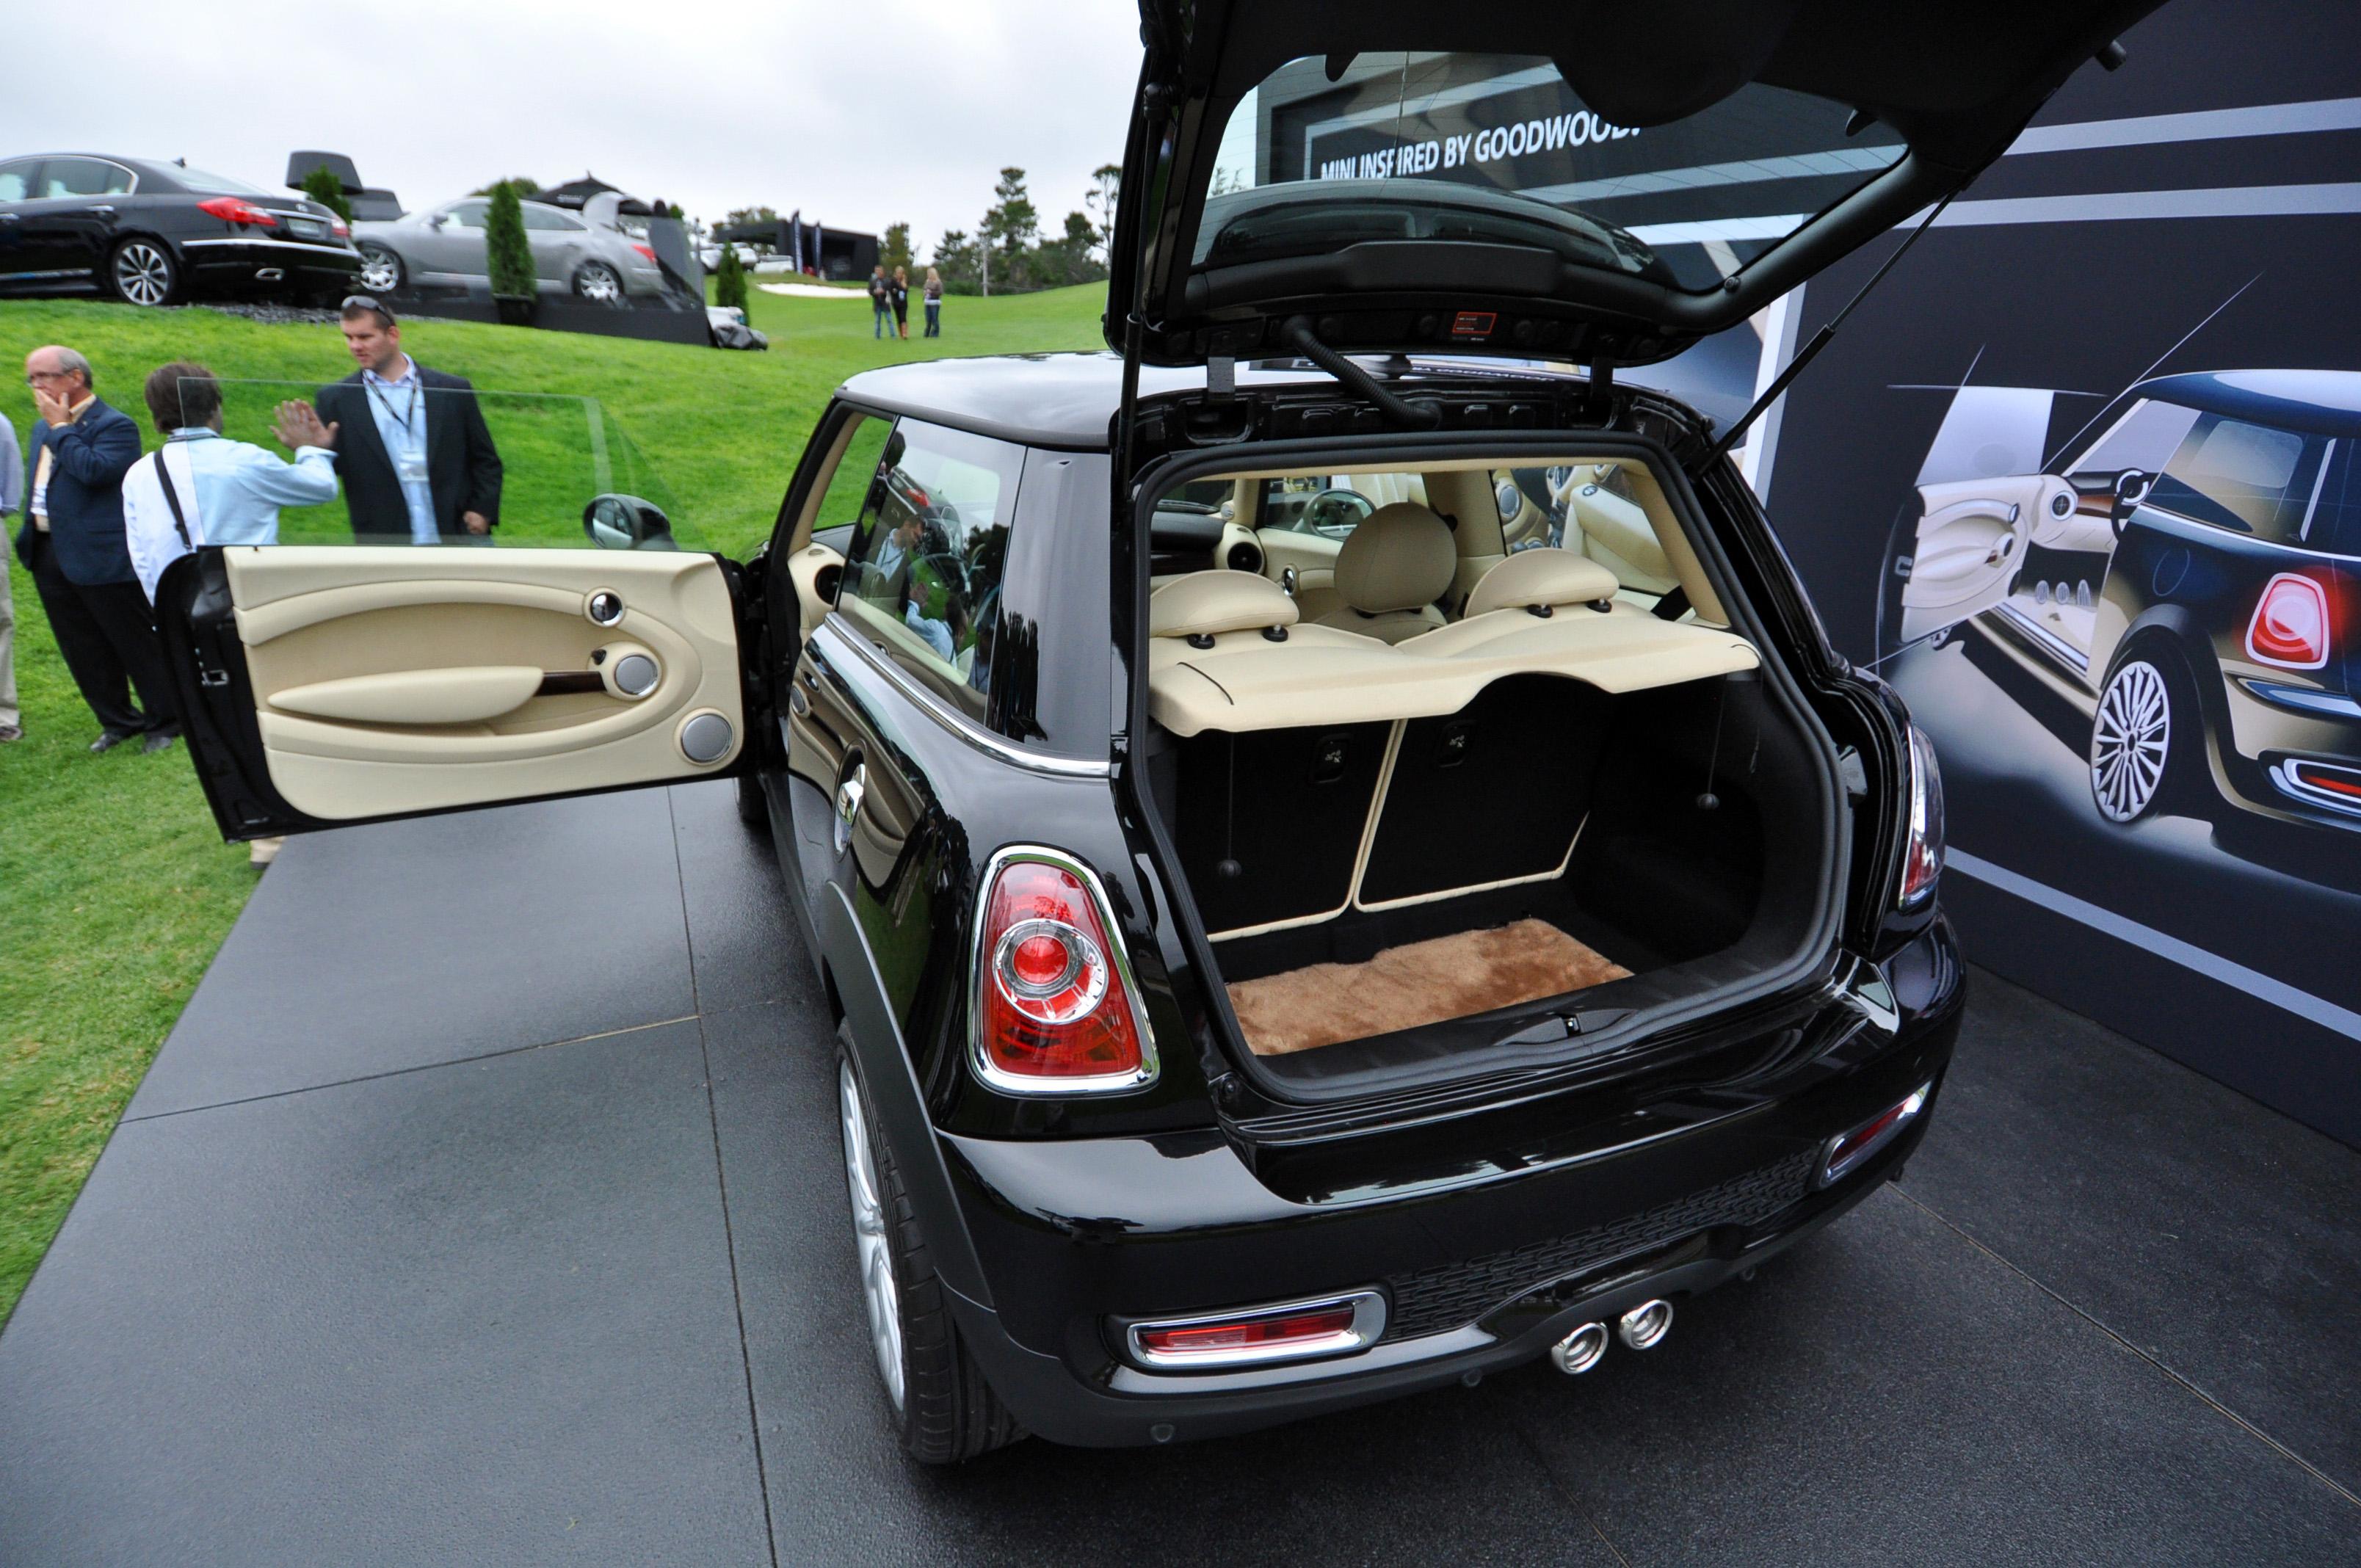 Mini Goodwood Debuts In The Us At Pebble Beach Motoringfile